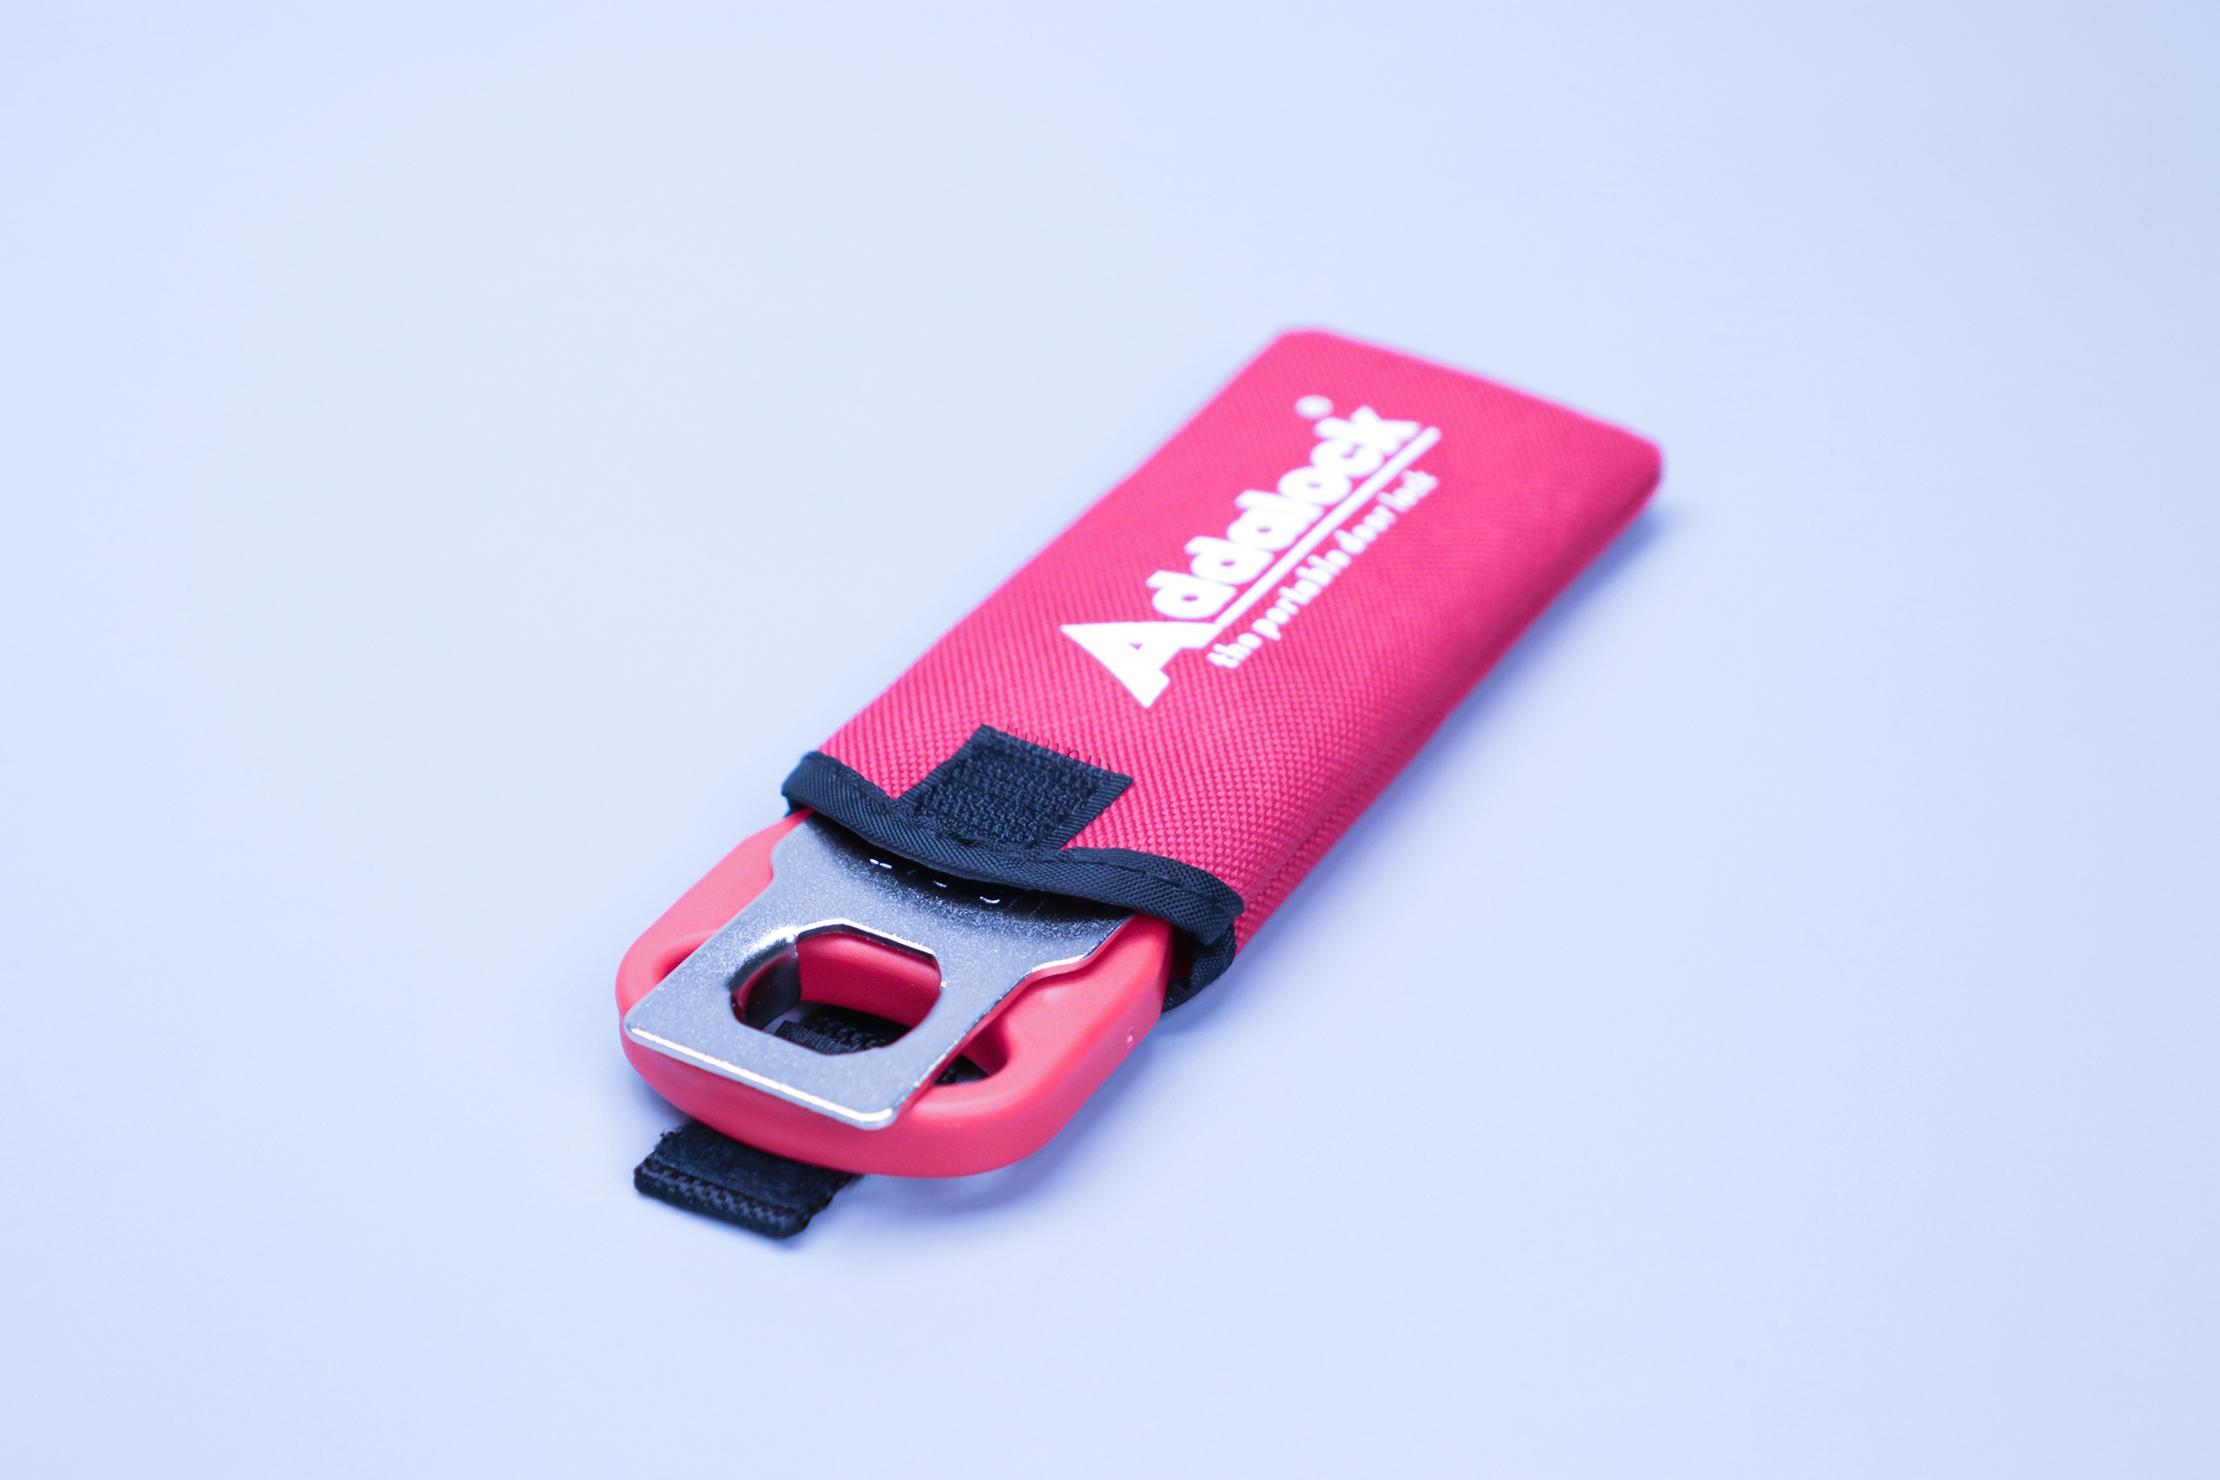 Addalock Portable Door Lock in Sleeve